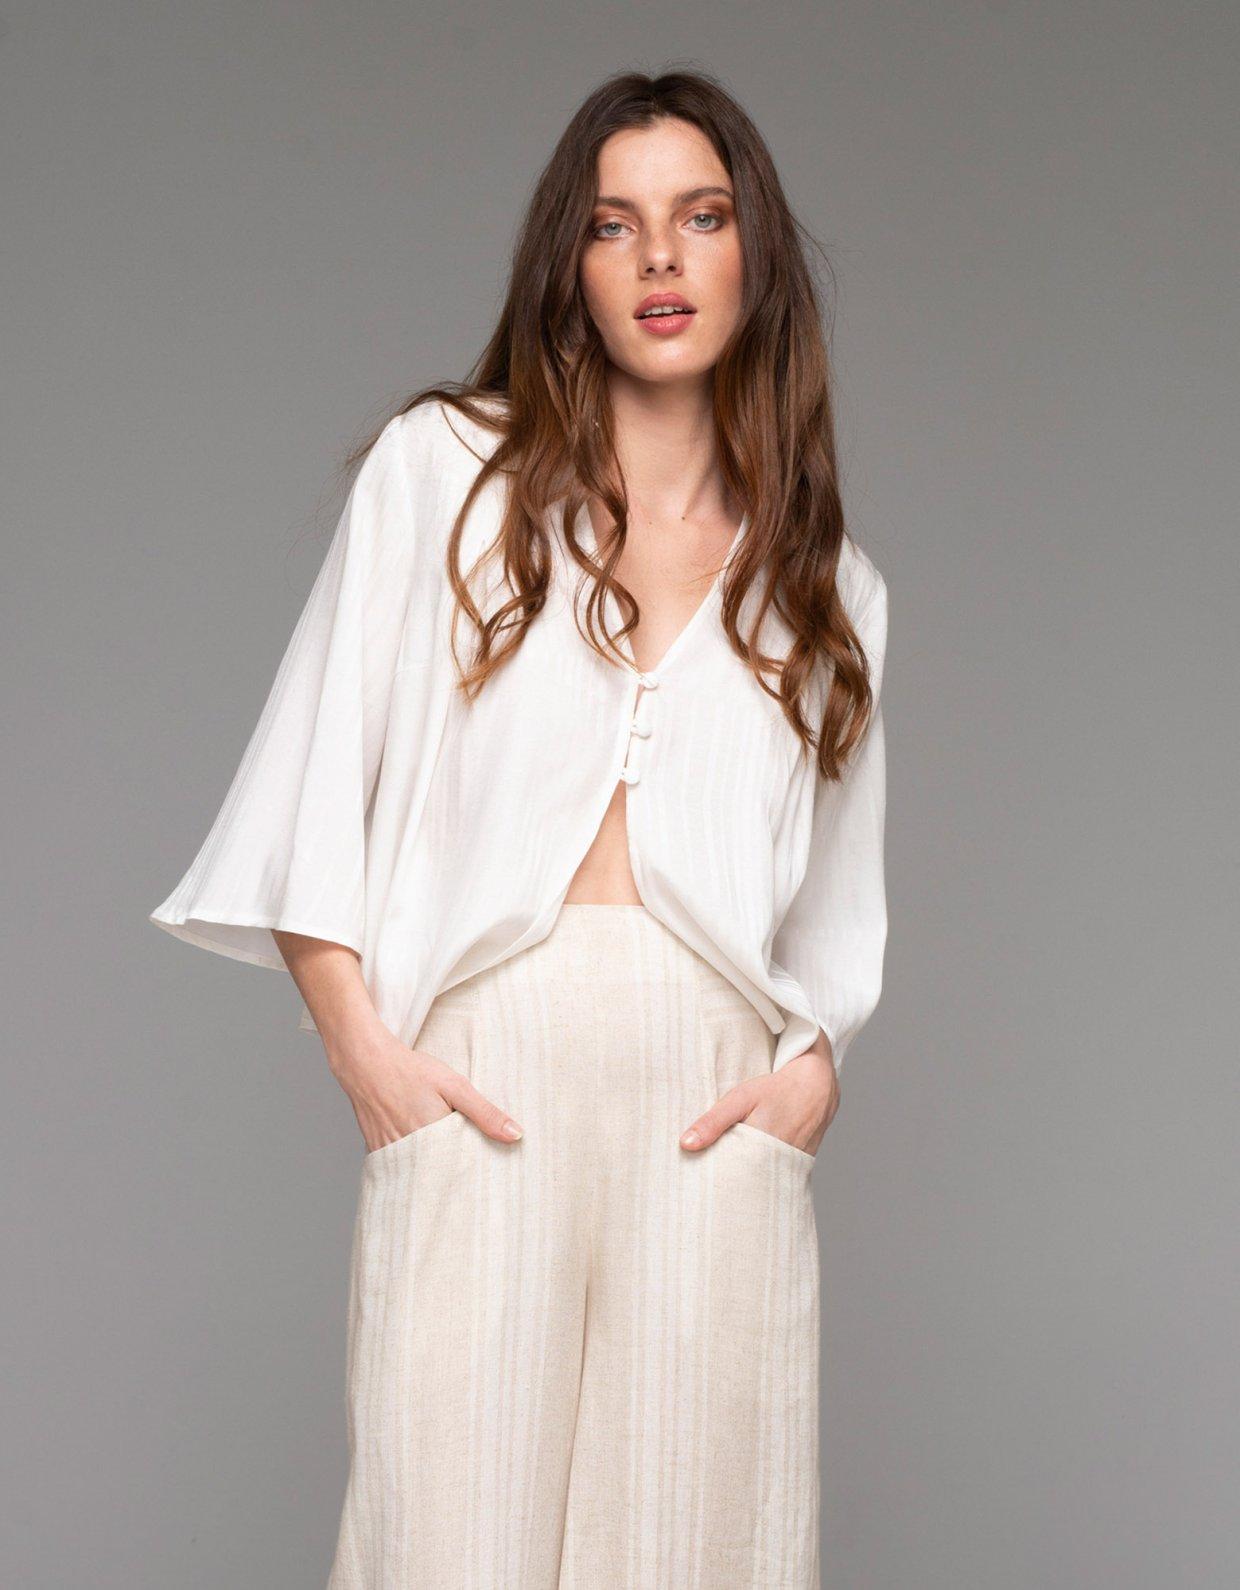 Nadia Rapti Saint Tropez shirt white